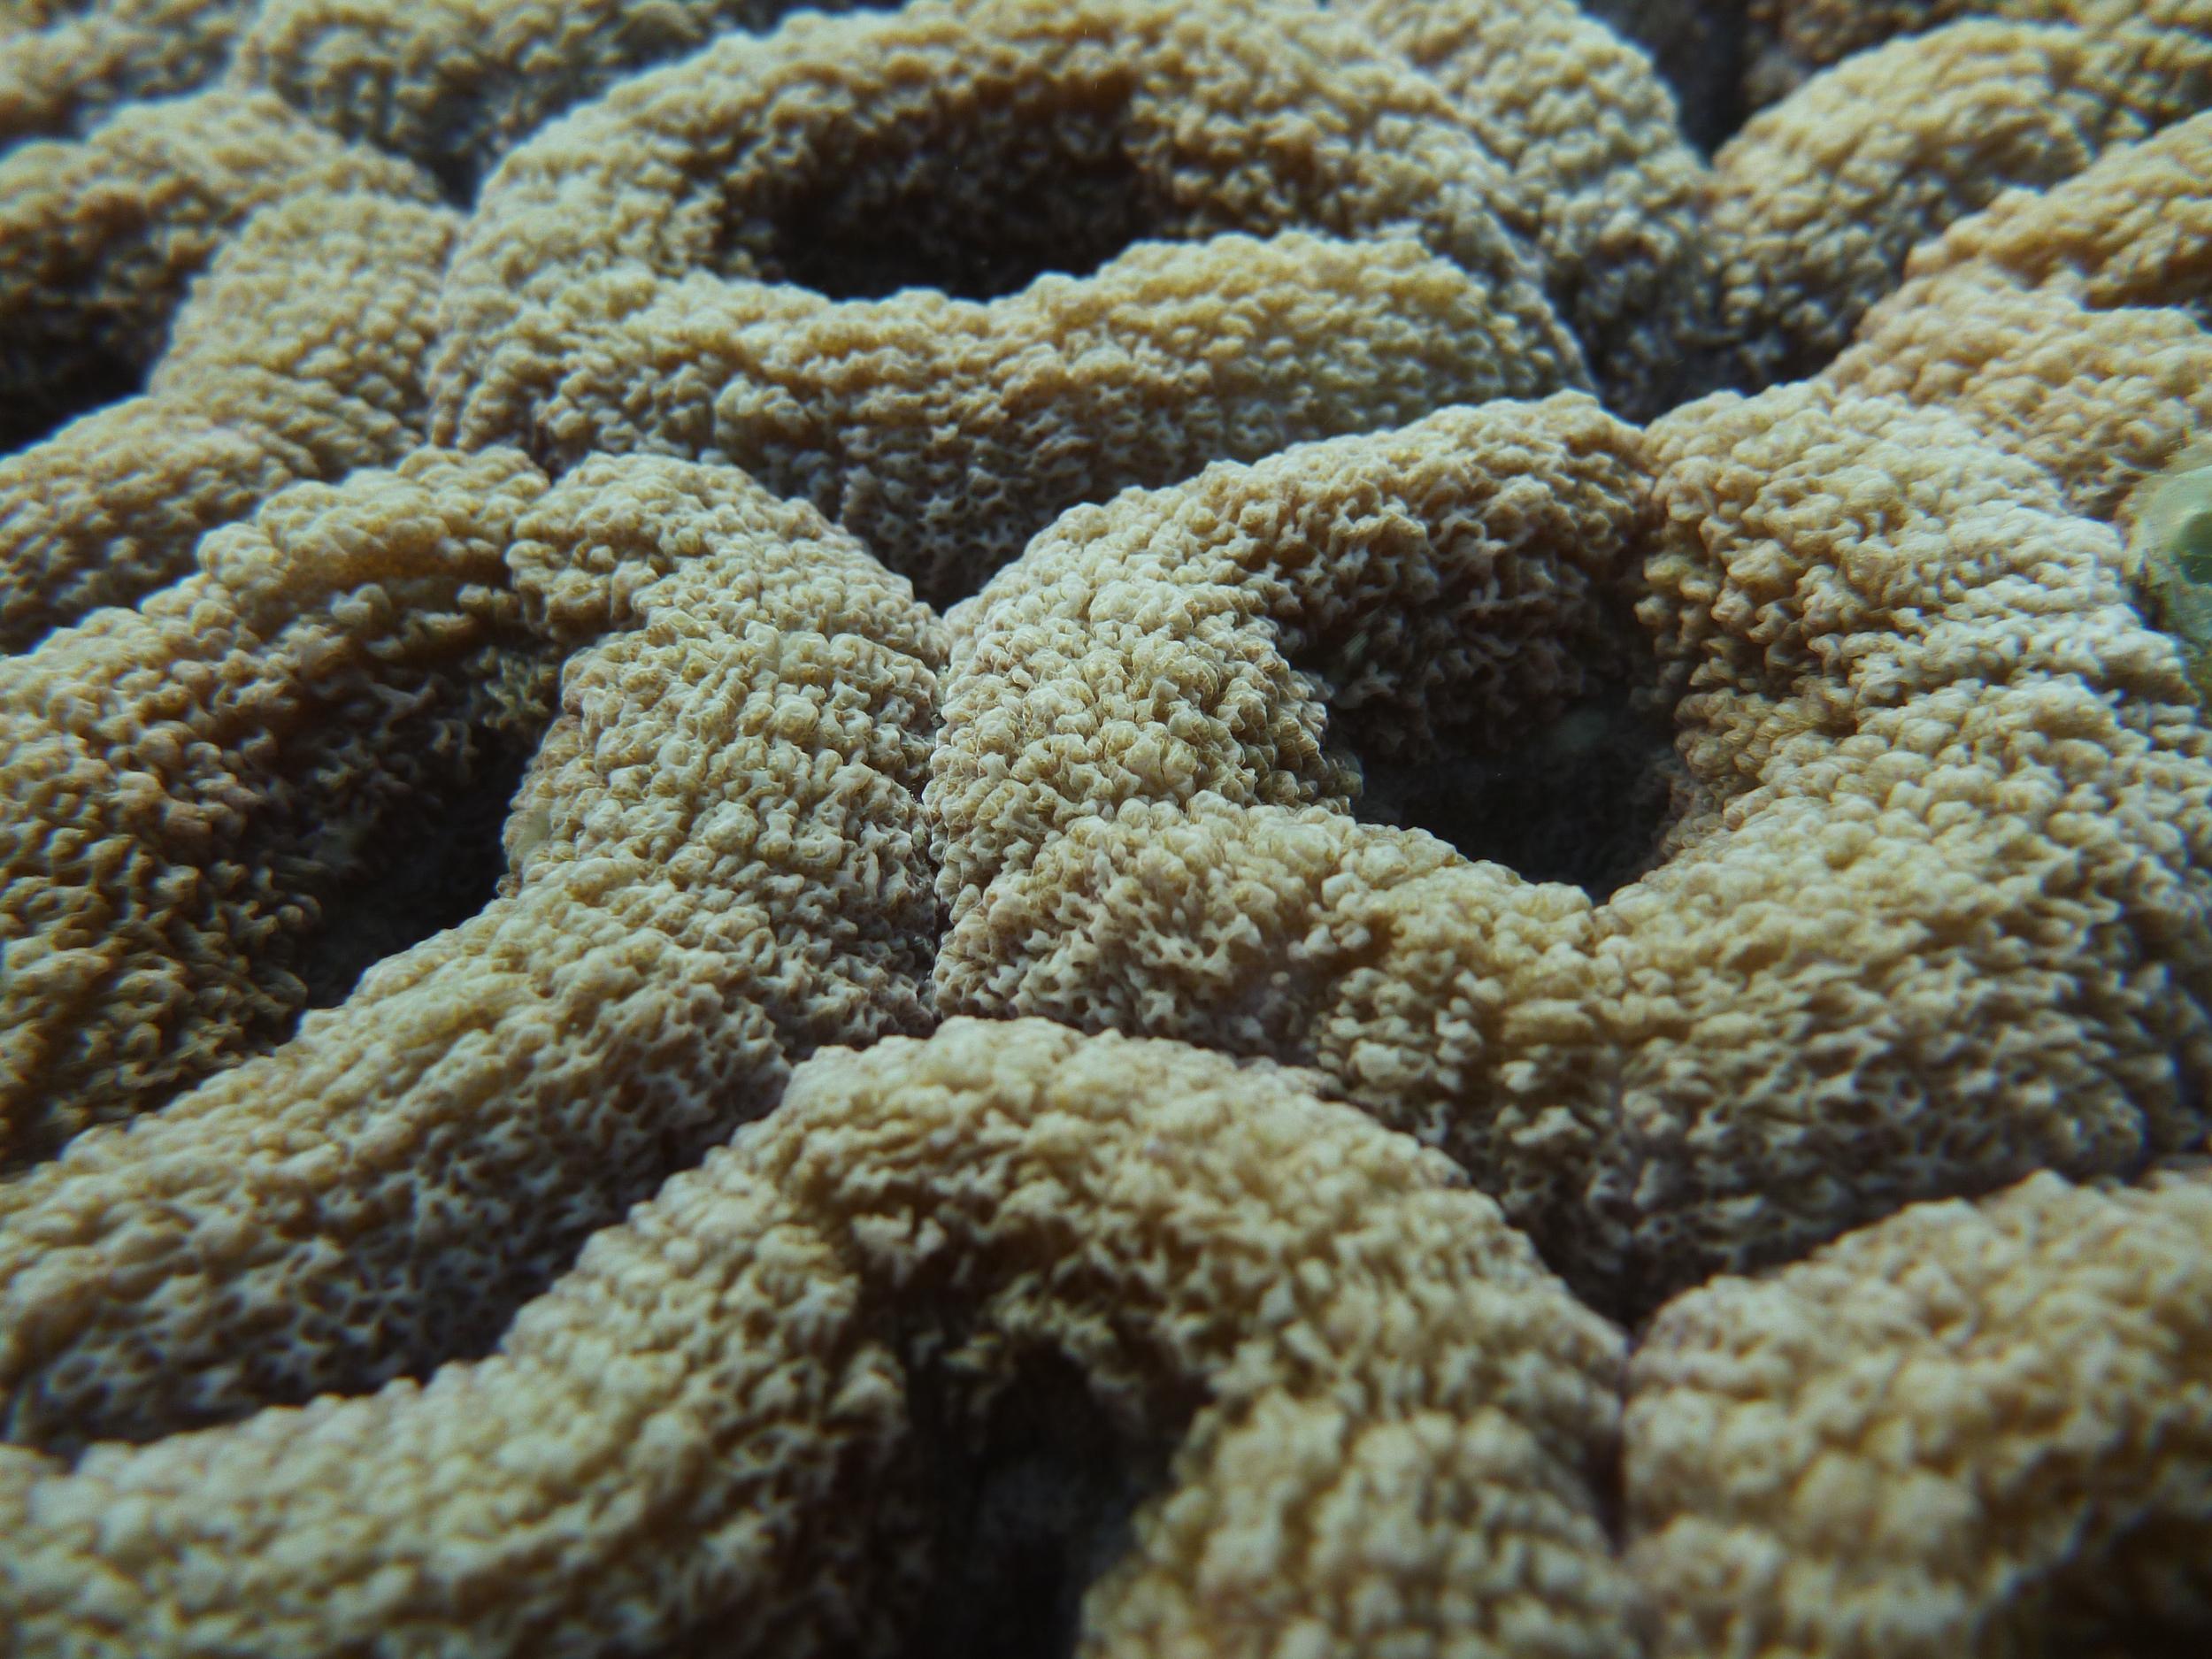 A closeup of a large polyp....